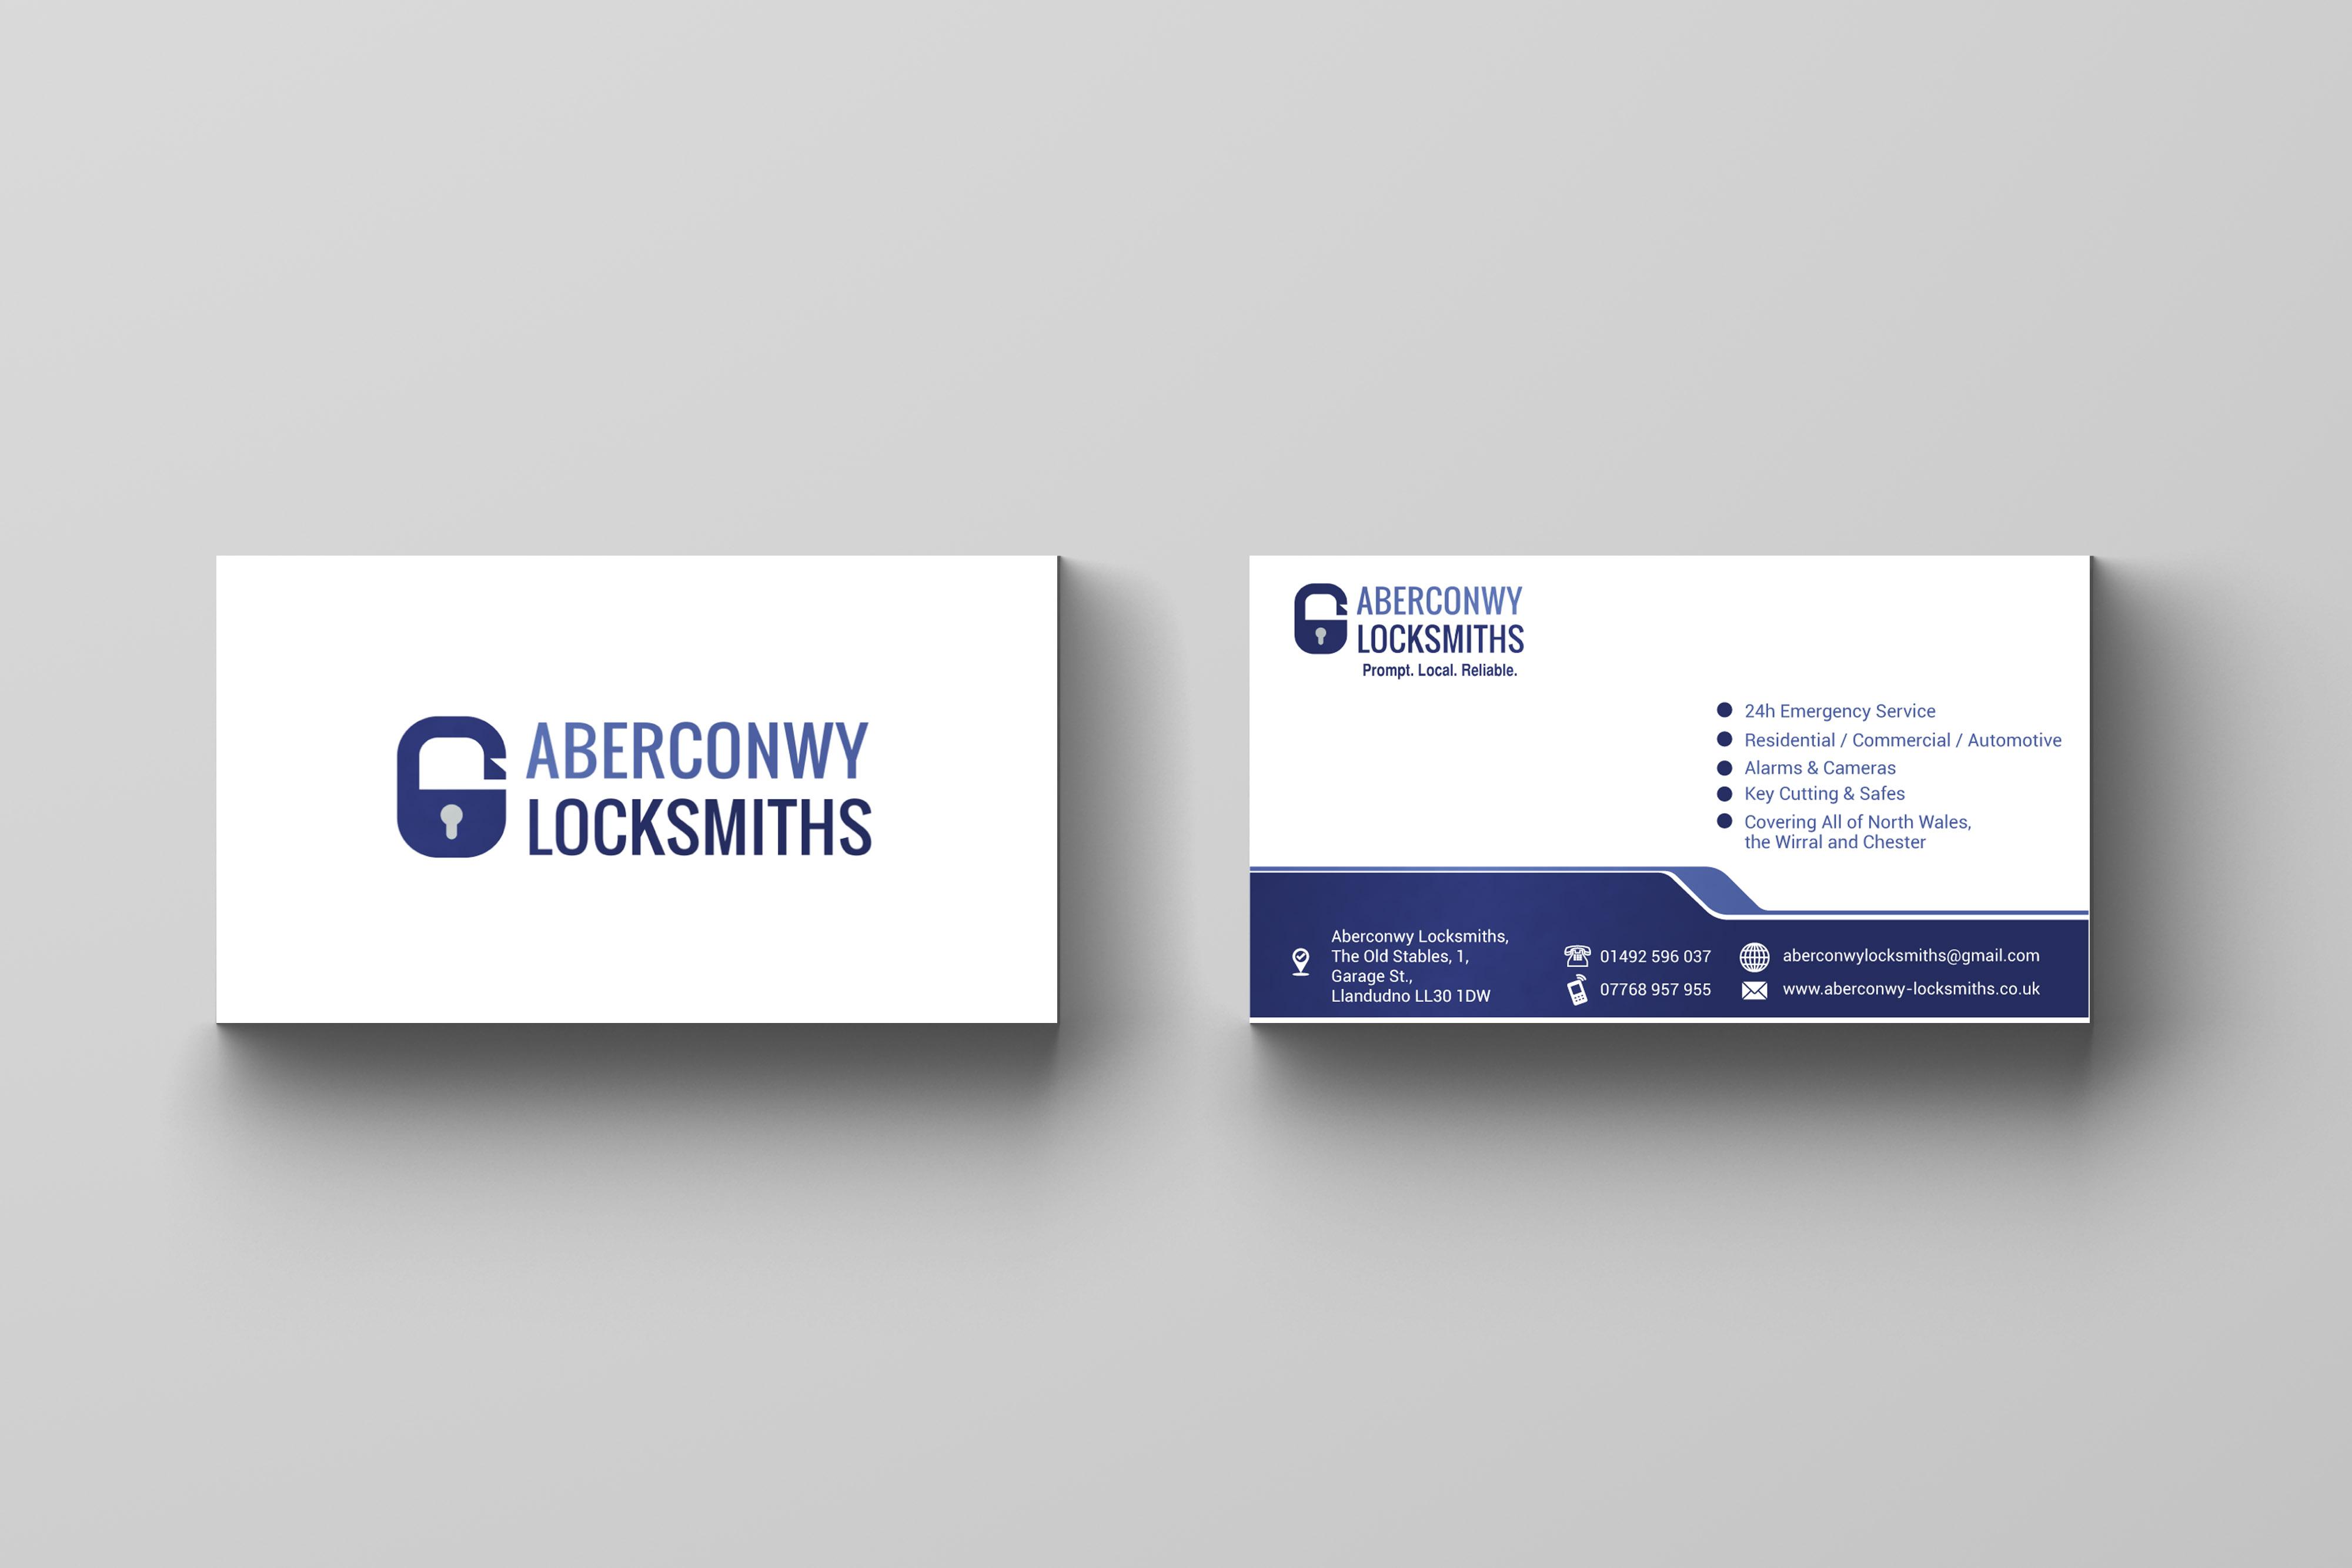 Elegant Playful Locksmith Business Card Design For A Company By Sonar Tari Design 21889613